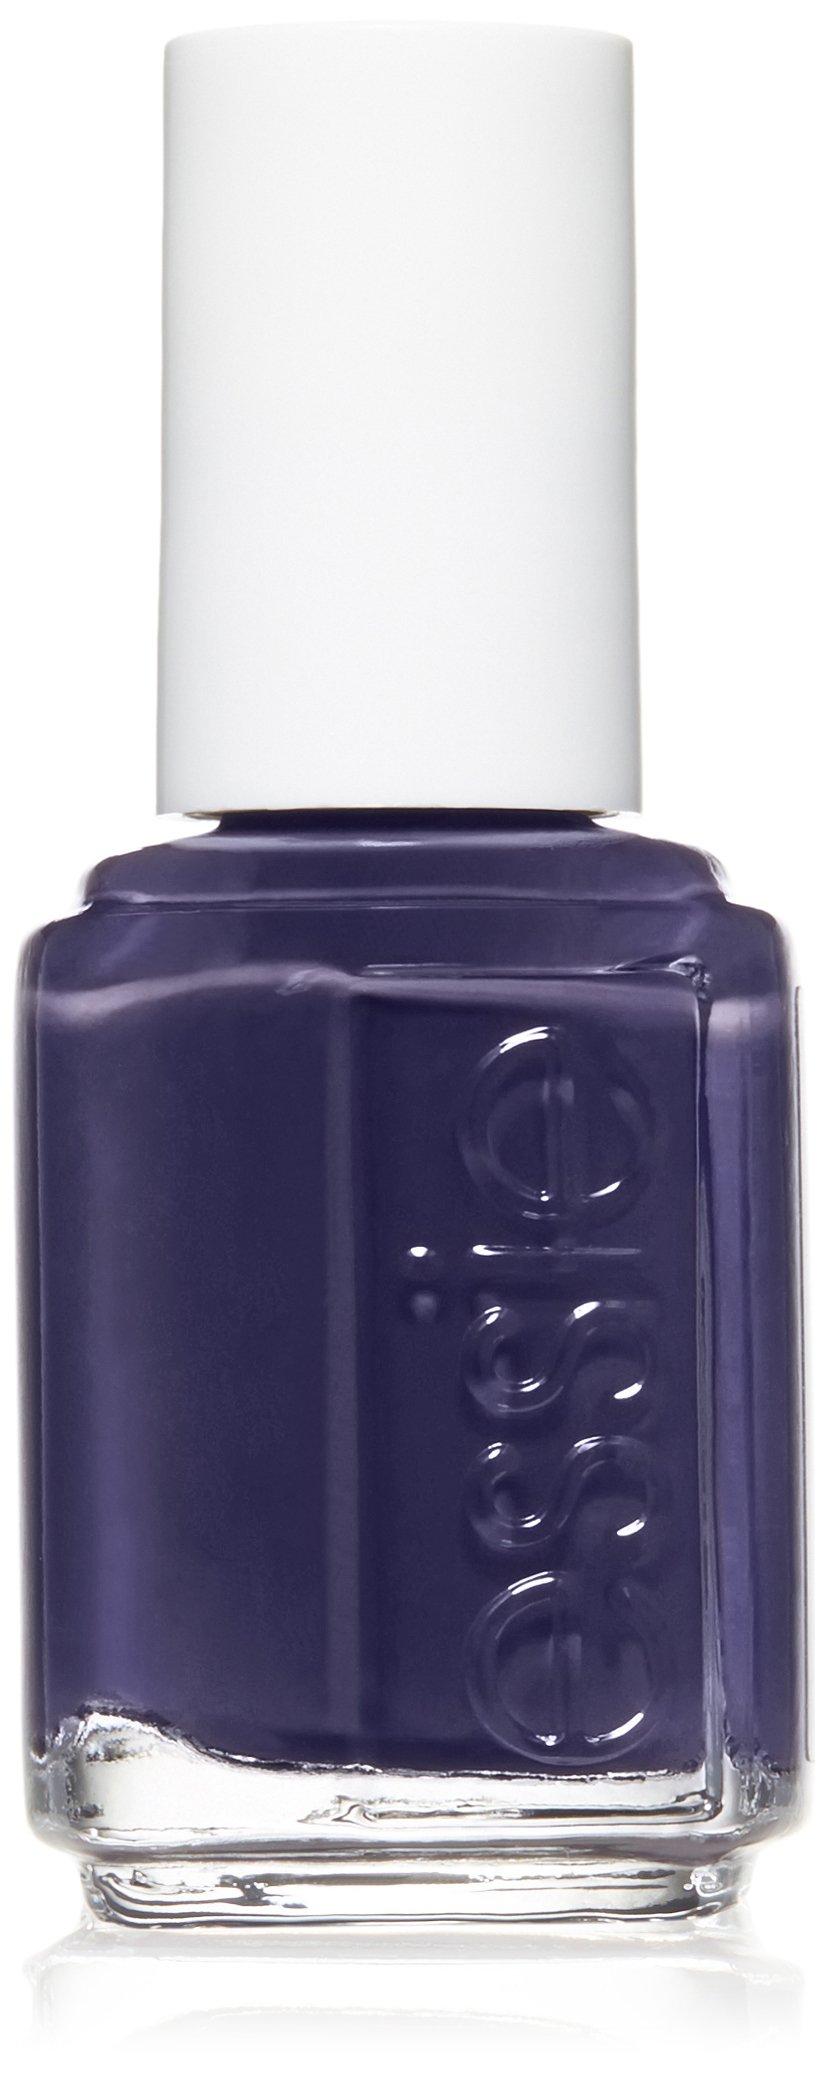 Amazon.com : essie nail polish, go overboard, blue nail polish, 0.46 ...